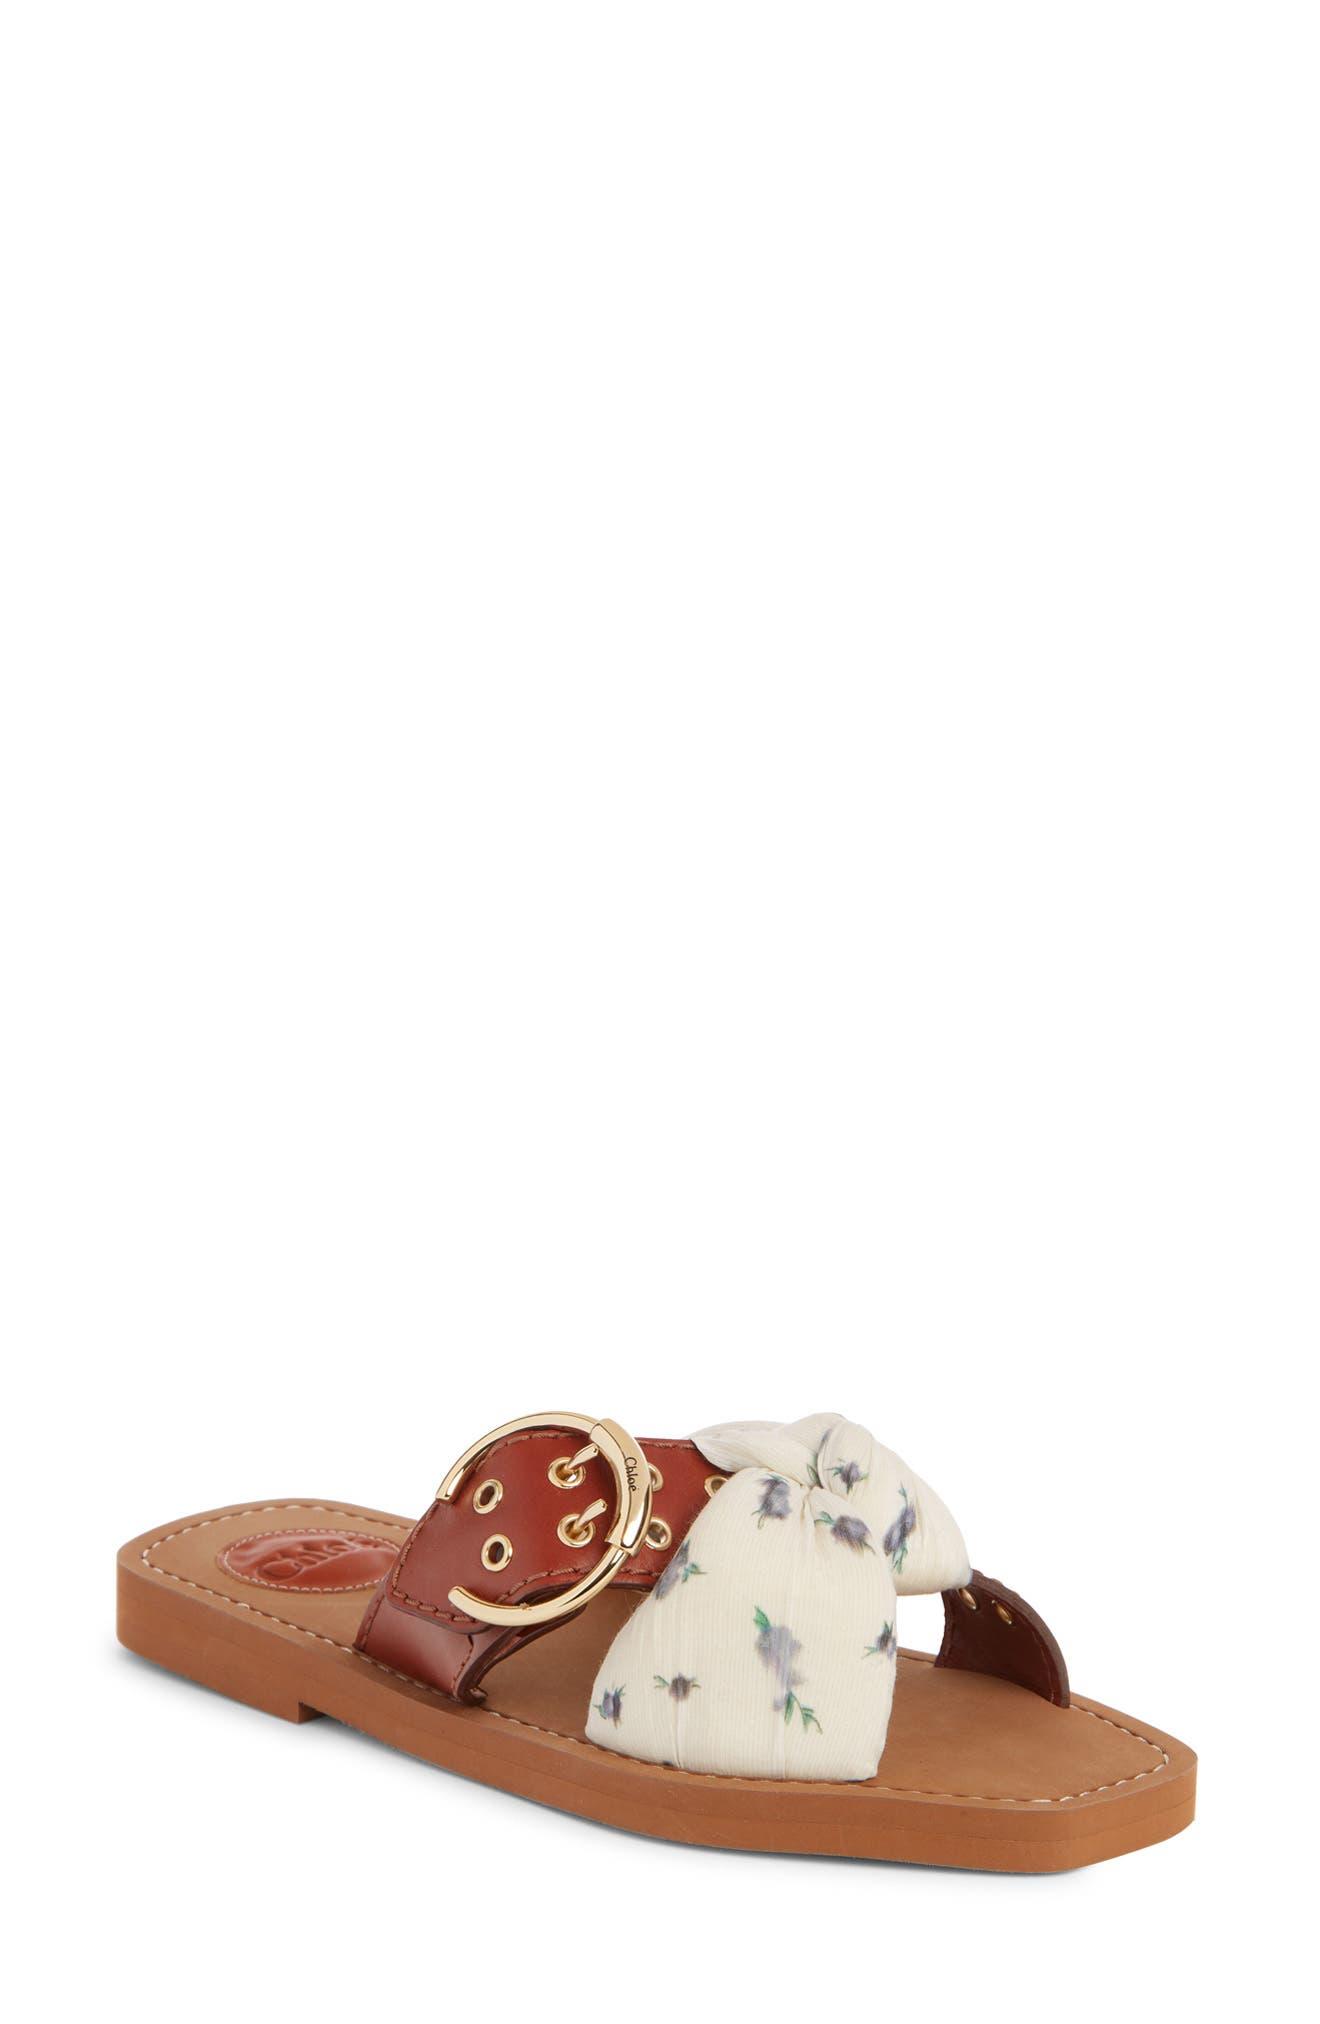 merrell sandals size 11 yupoo